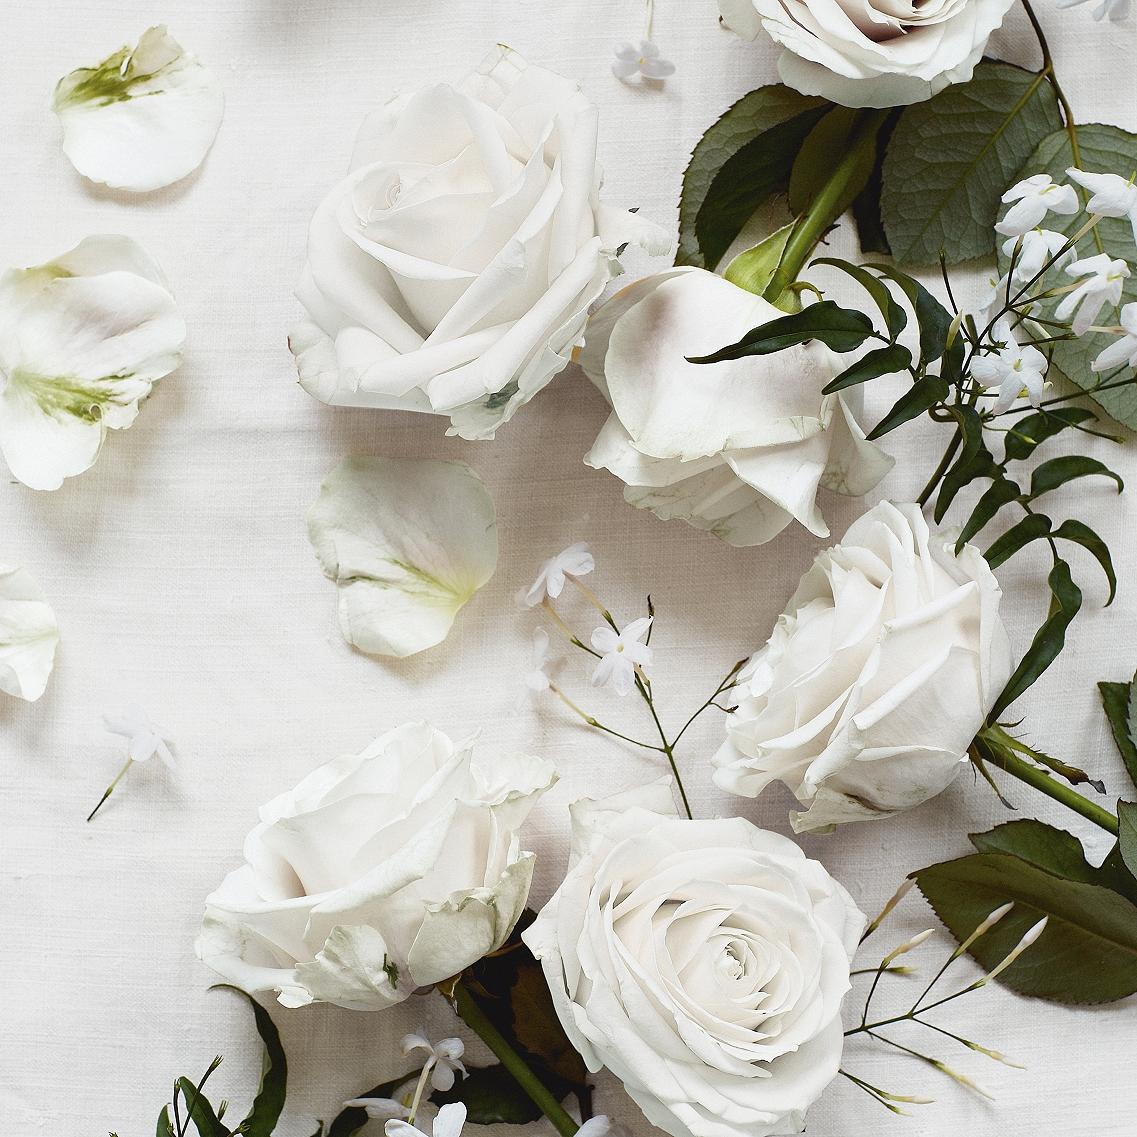 The White Company - Shampoo, Conditioner, Bath & Shower GelFlowersScented Jasmine, Rose & Neroli(image courtesy The White Company)